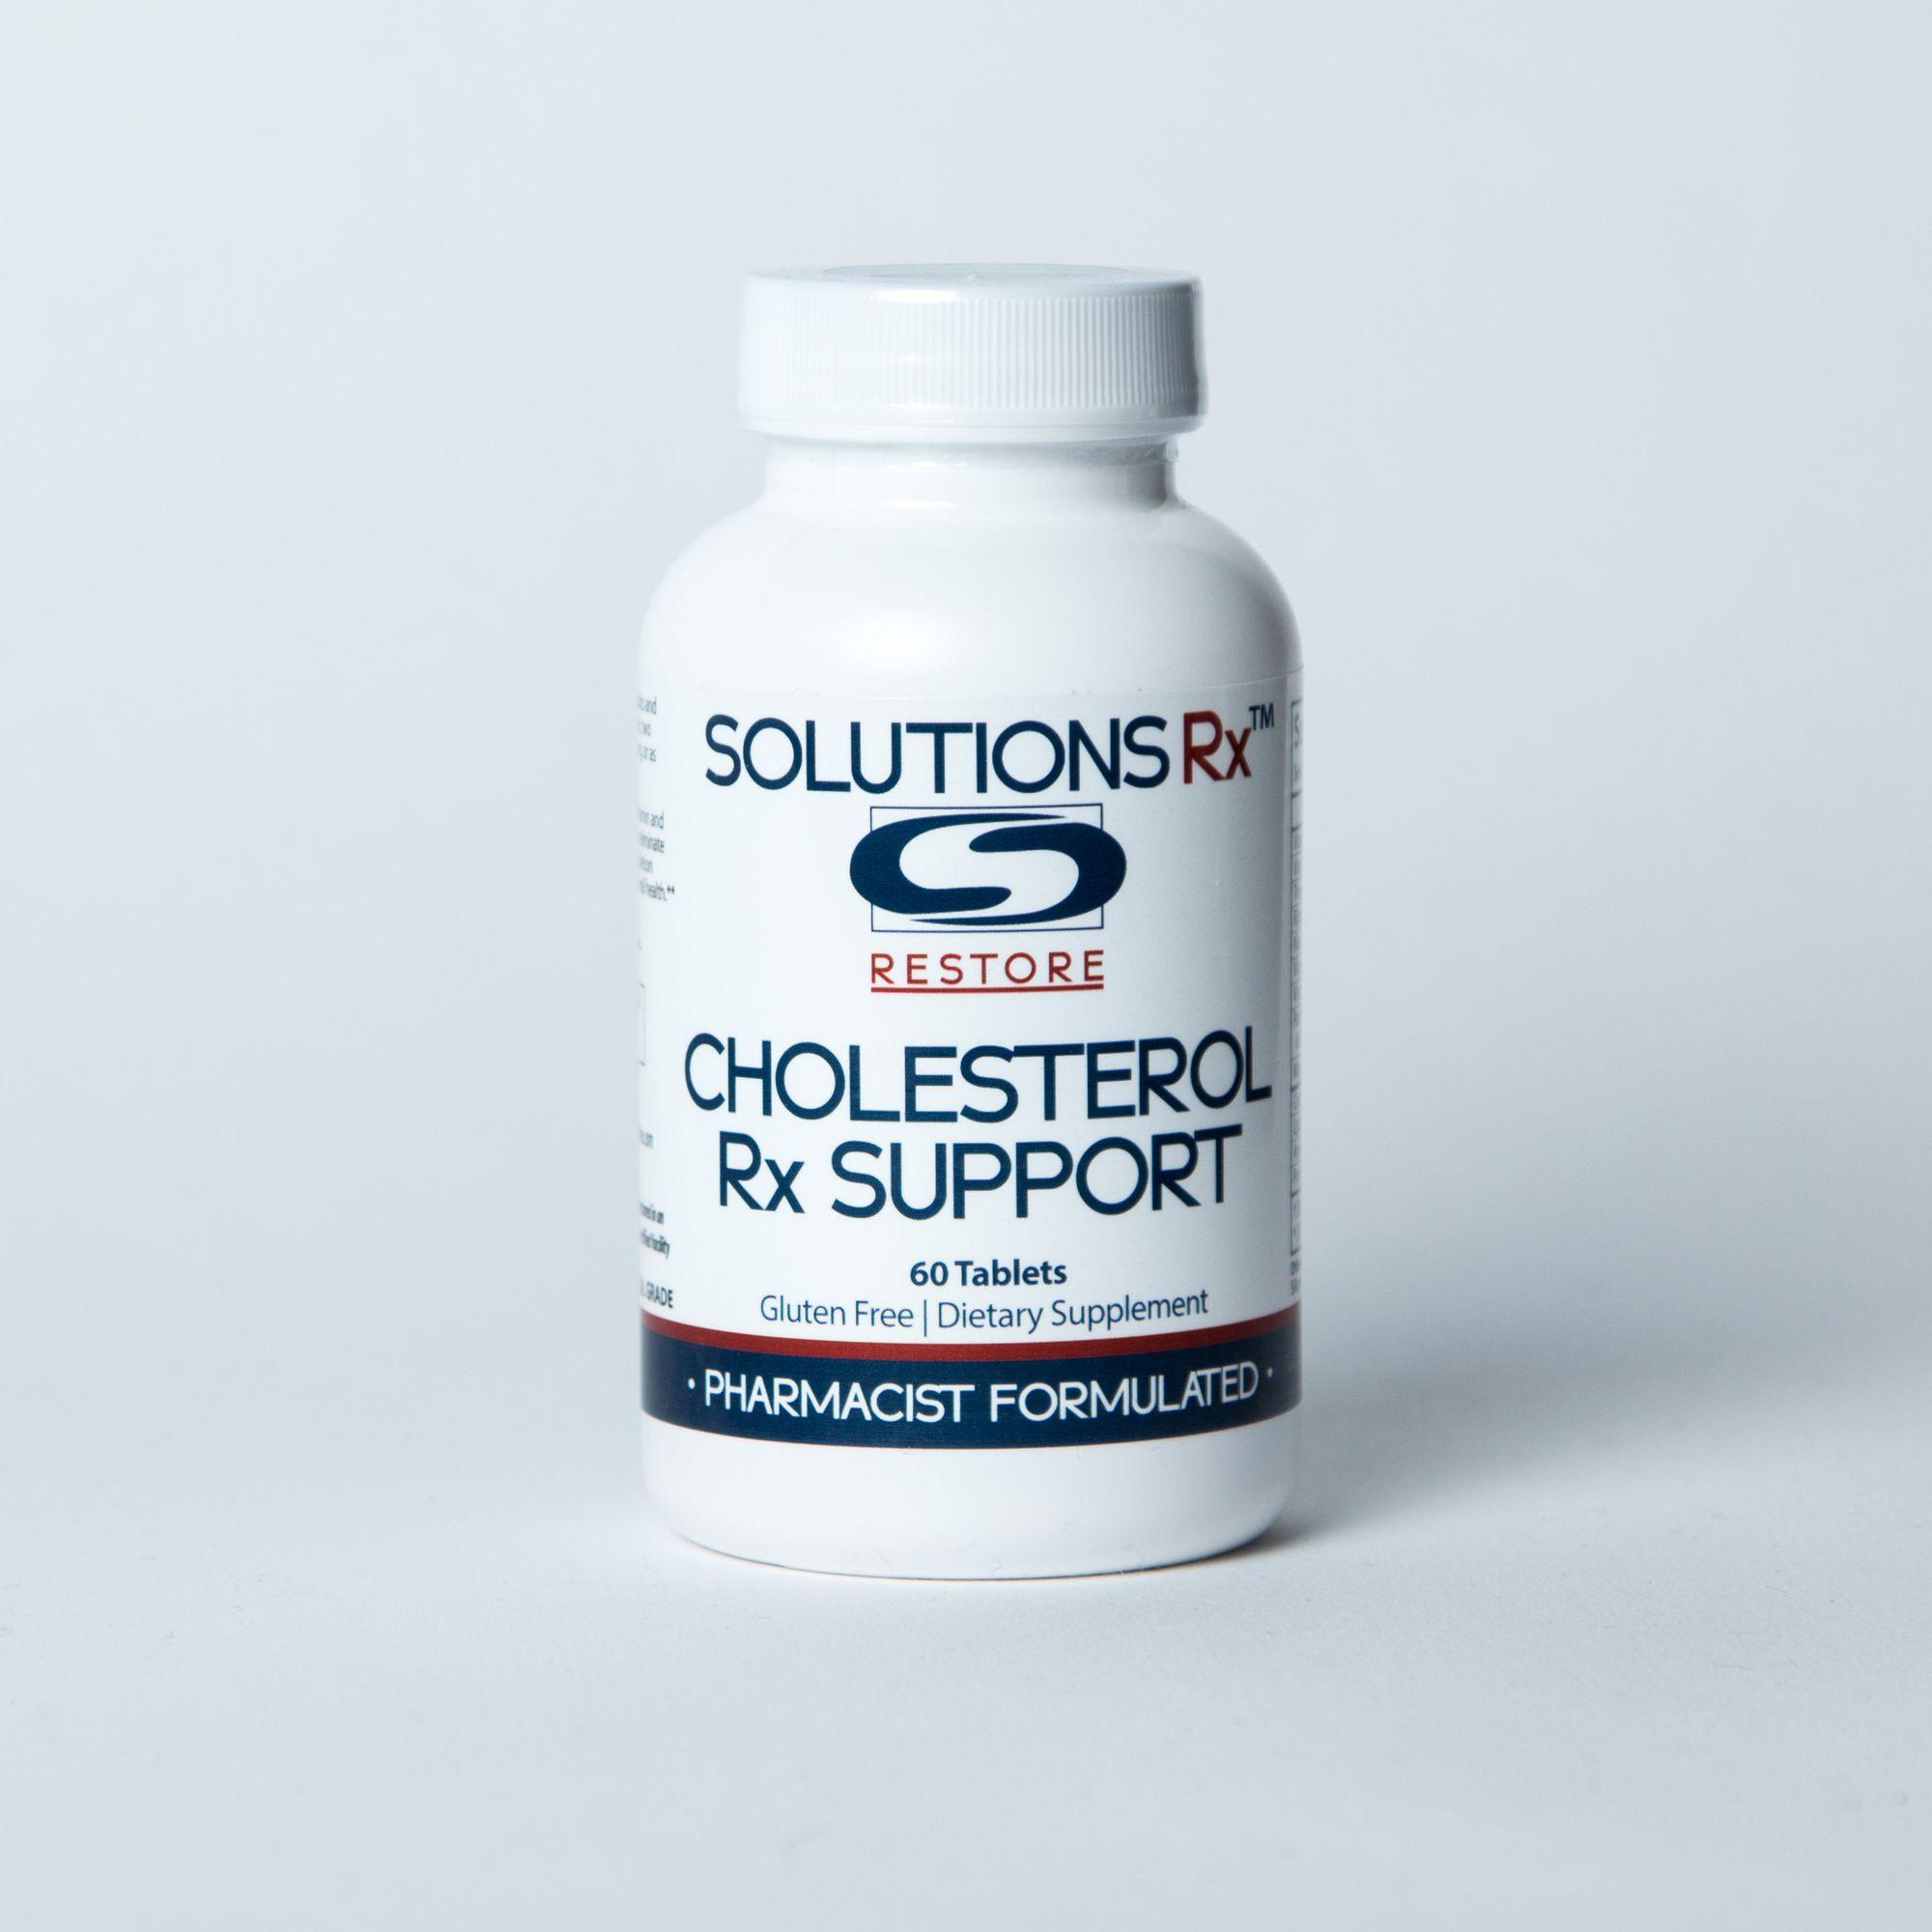 SolutionsRX_Cholesterol_Rx_Support_60ct.jpg